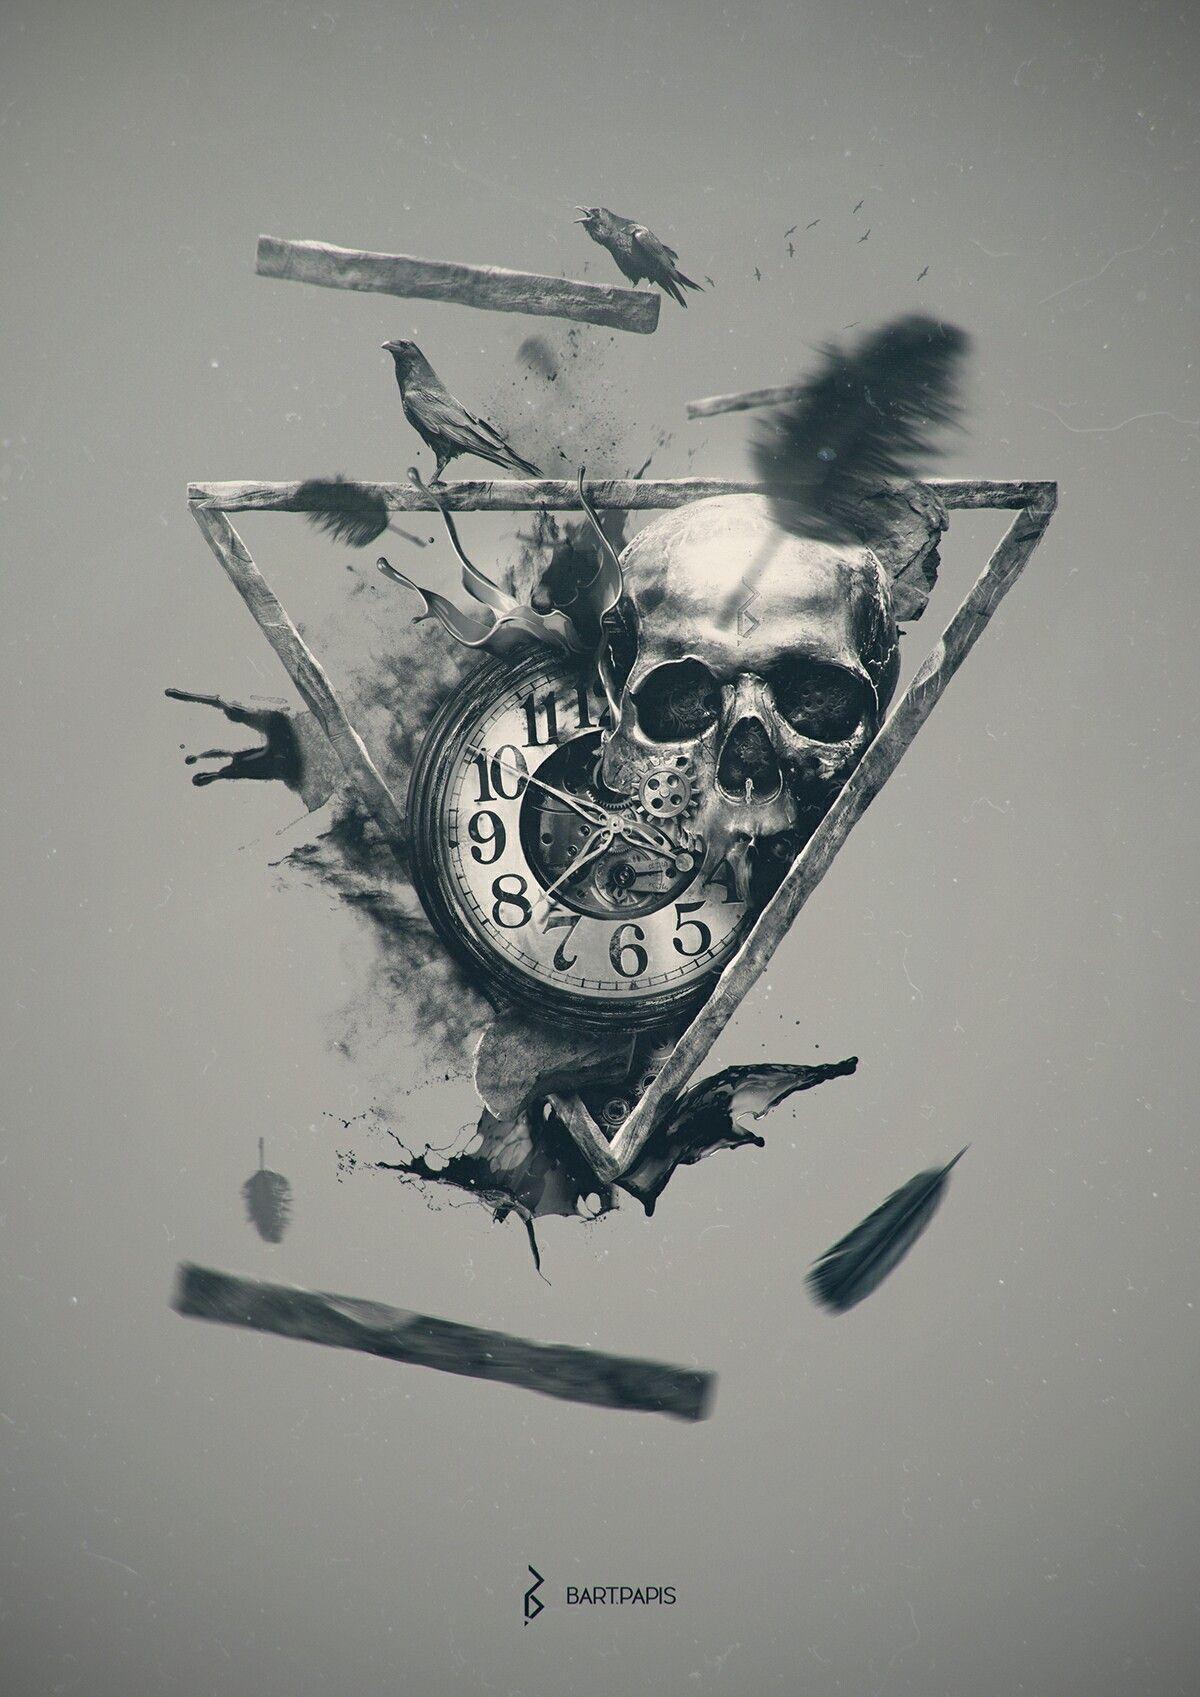 Creative clock background  Pin by Andrya Saran on Skulls and skeletons  Pinterest  Skeletons